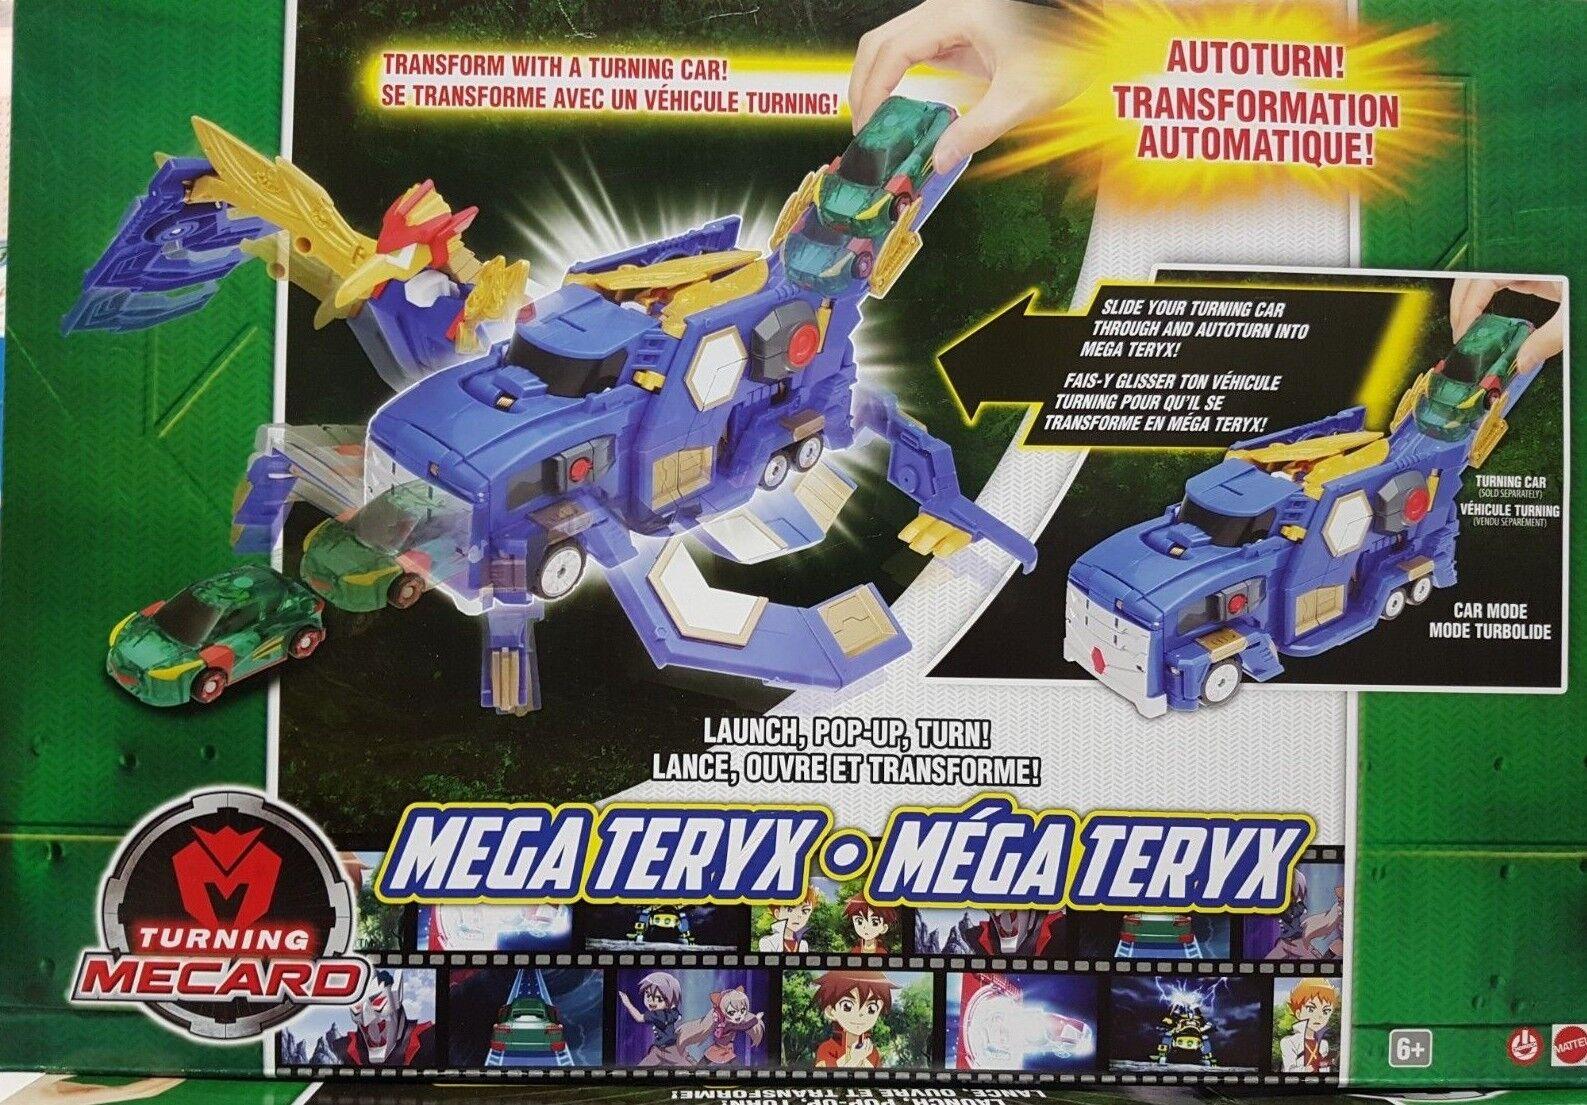 Nun mecard mega - teryx fahrzeug roboterspieizeug mattel nib